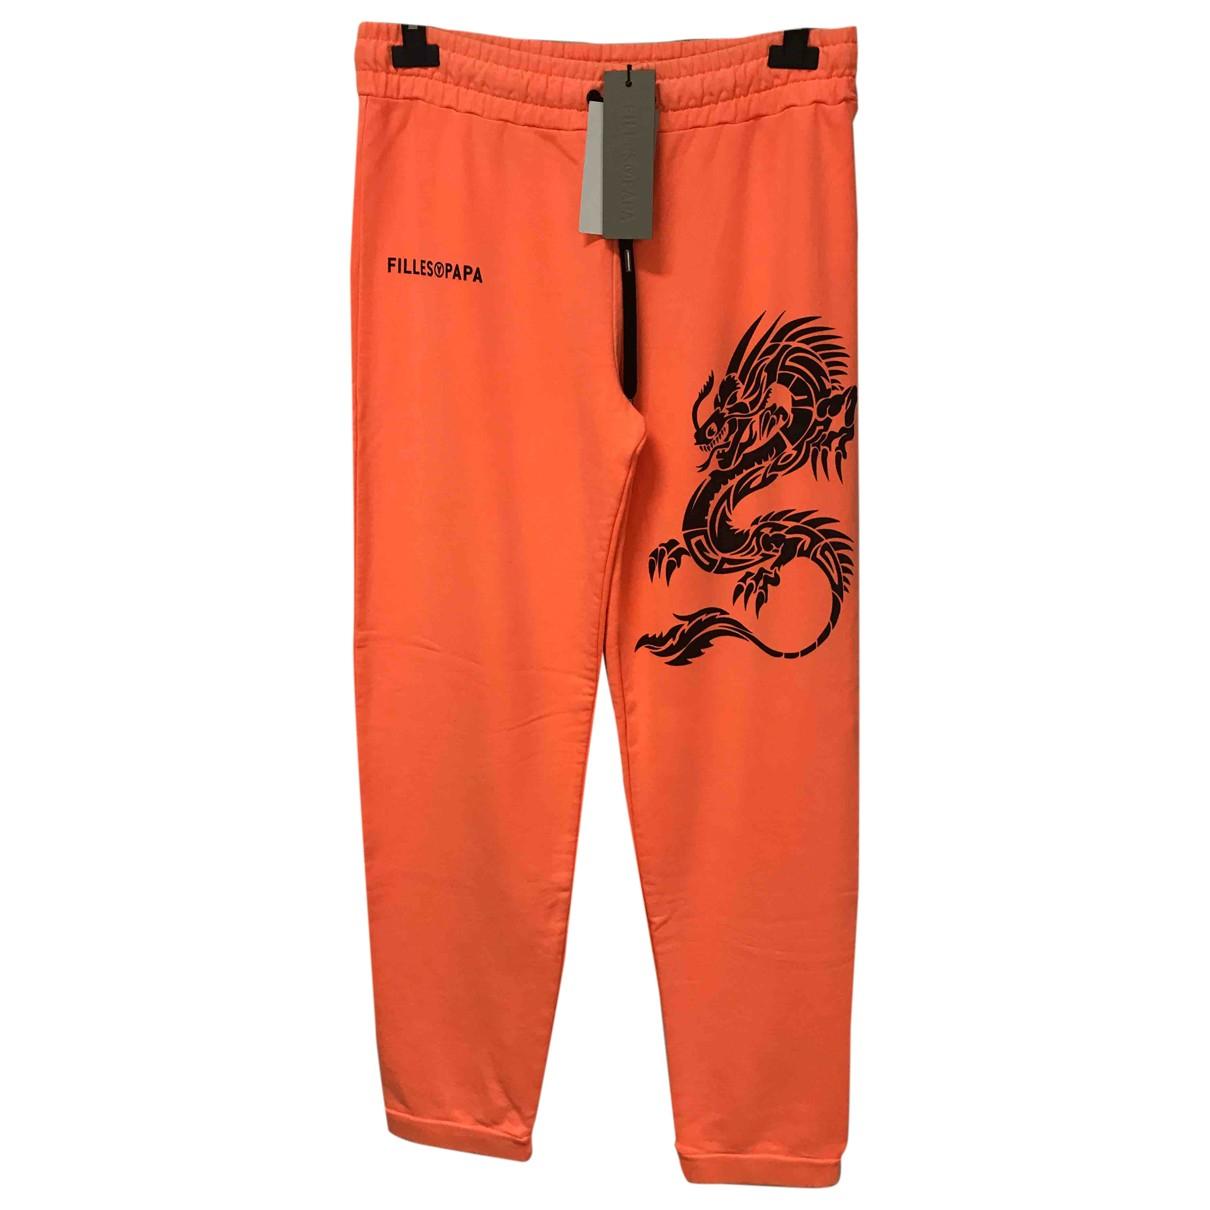 Filles À Papa \N Orange Cotton Trousers for Men M International